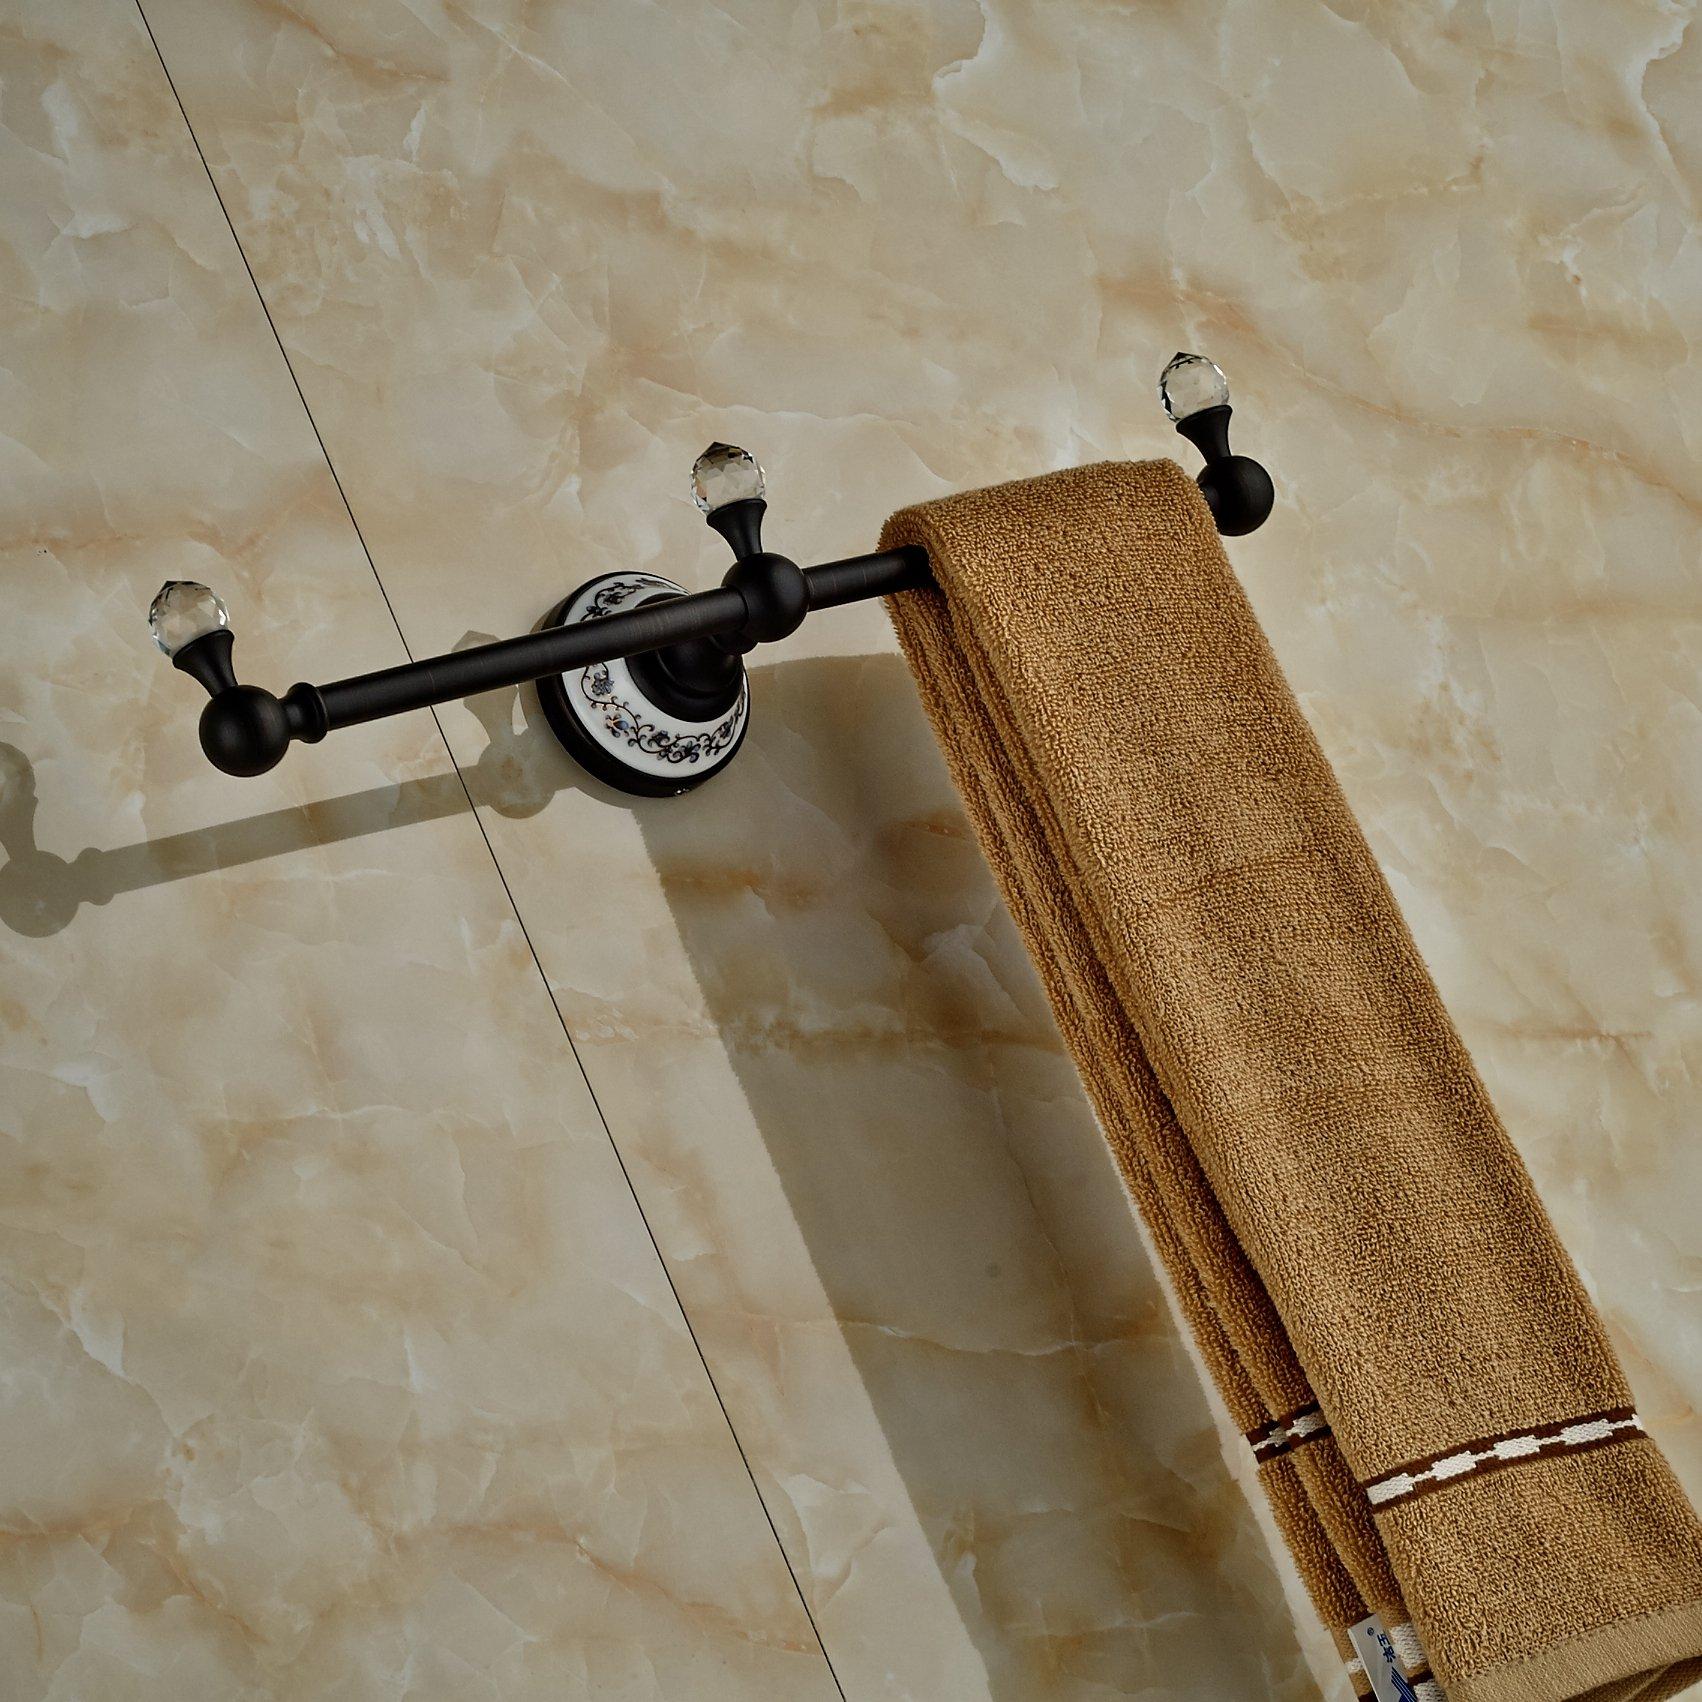 Luxury Crystal Deco Bath Towel Bar Wall Mounted Towel Rac Hanger (Oil Rubbed Bronze) by Rozin (Image #8)